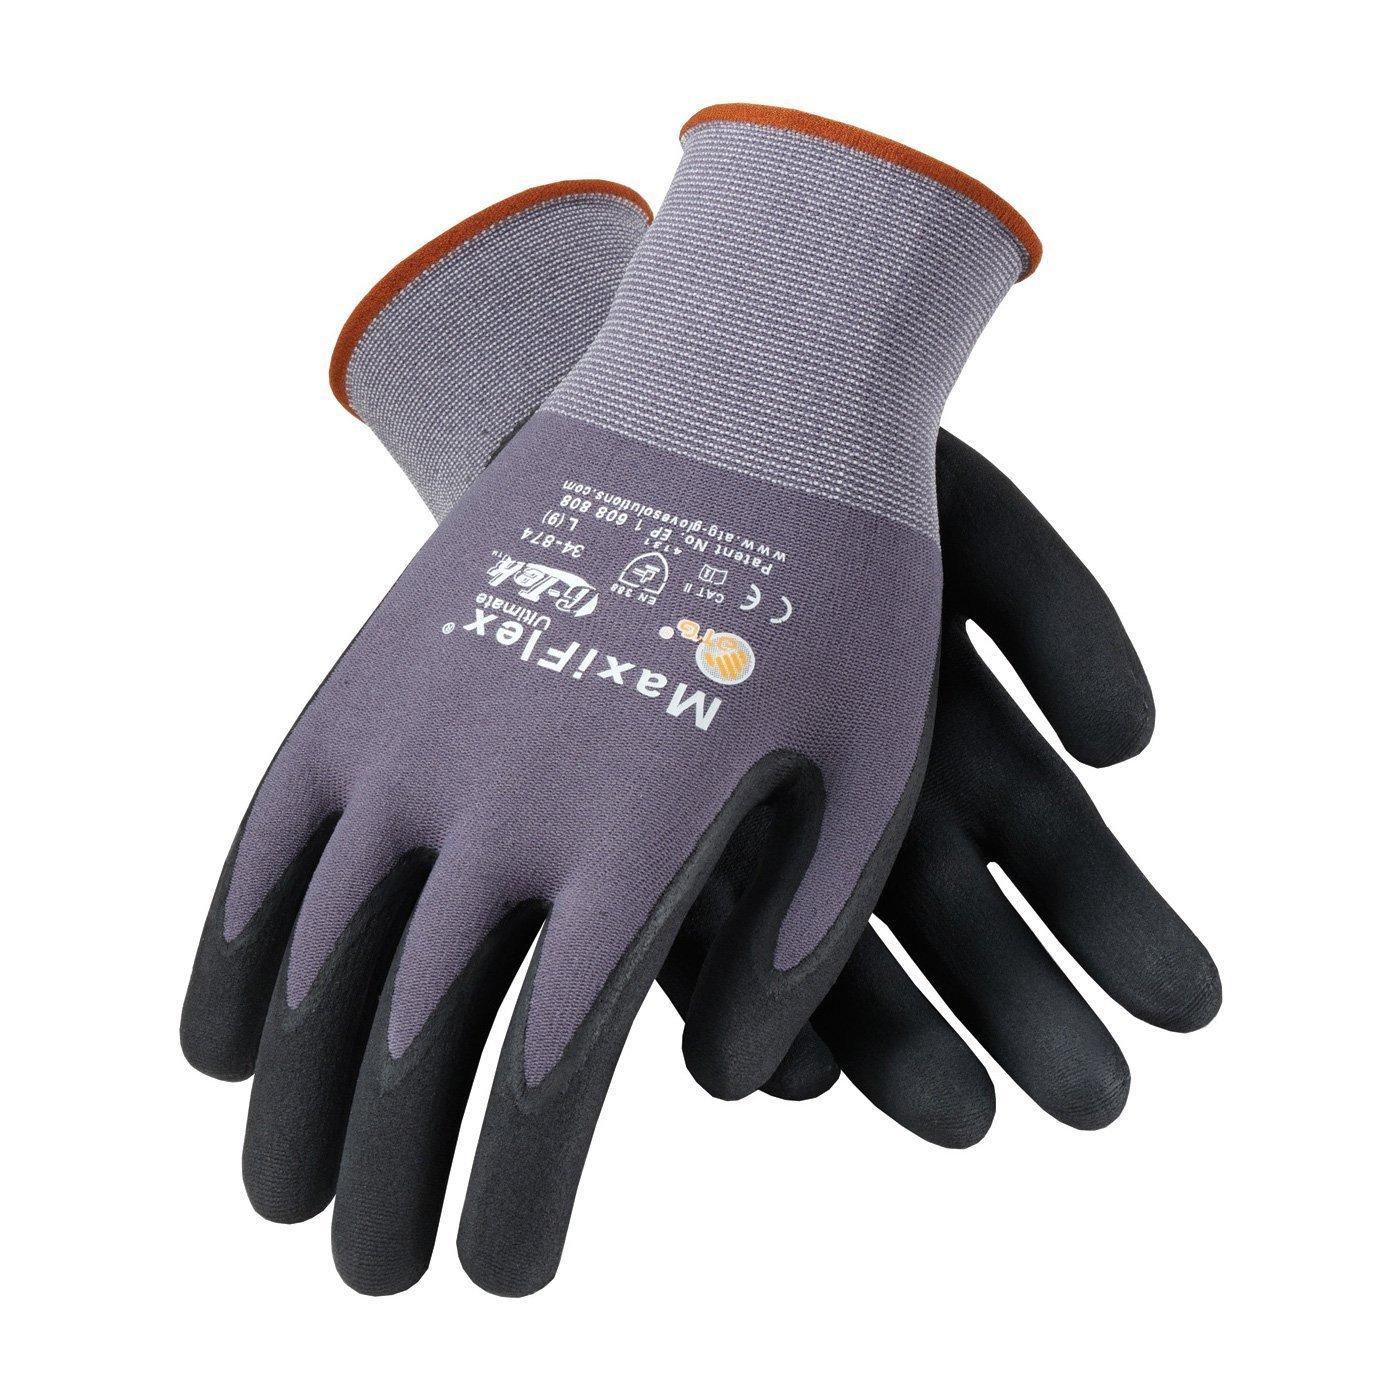 3 Pack 34-874 MaxiFlex Ultimate Nitrile Grip Work Gloves Sizes S-XL (Medium) XMS141